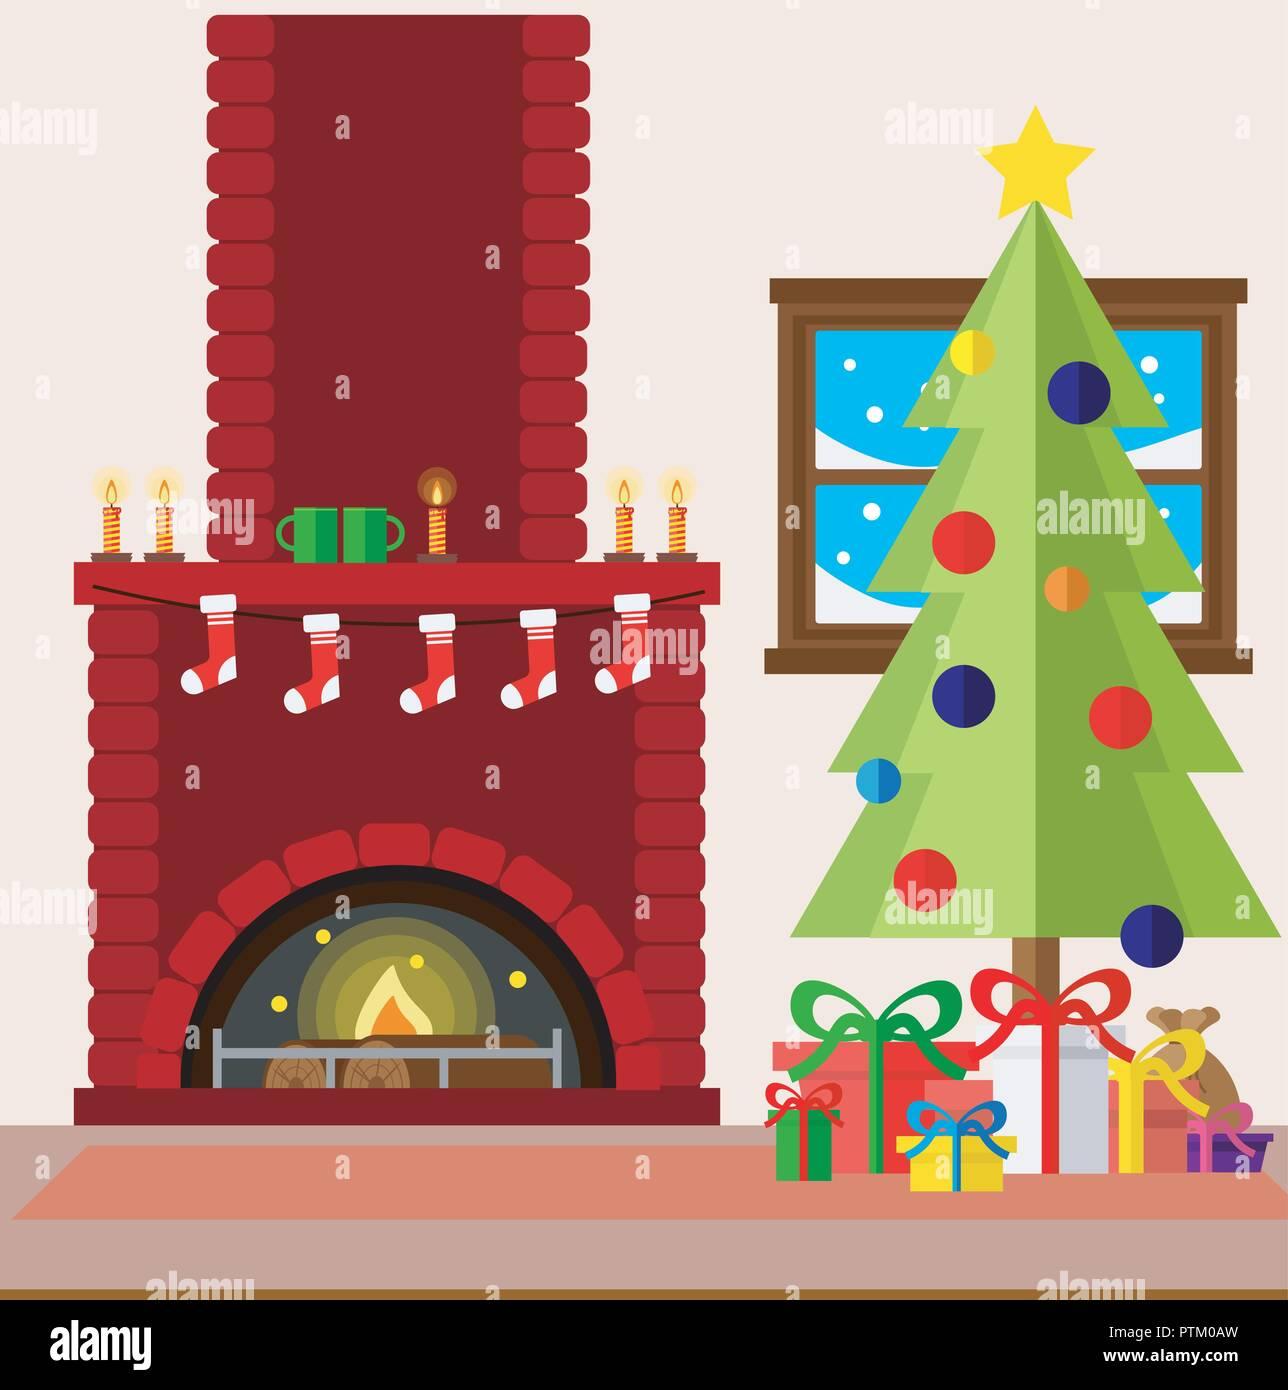 Dibujos Chimeneas De Navidad.Navidad Chimenea Sala Interior En Un Colorido Estilo Plano